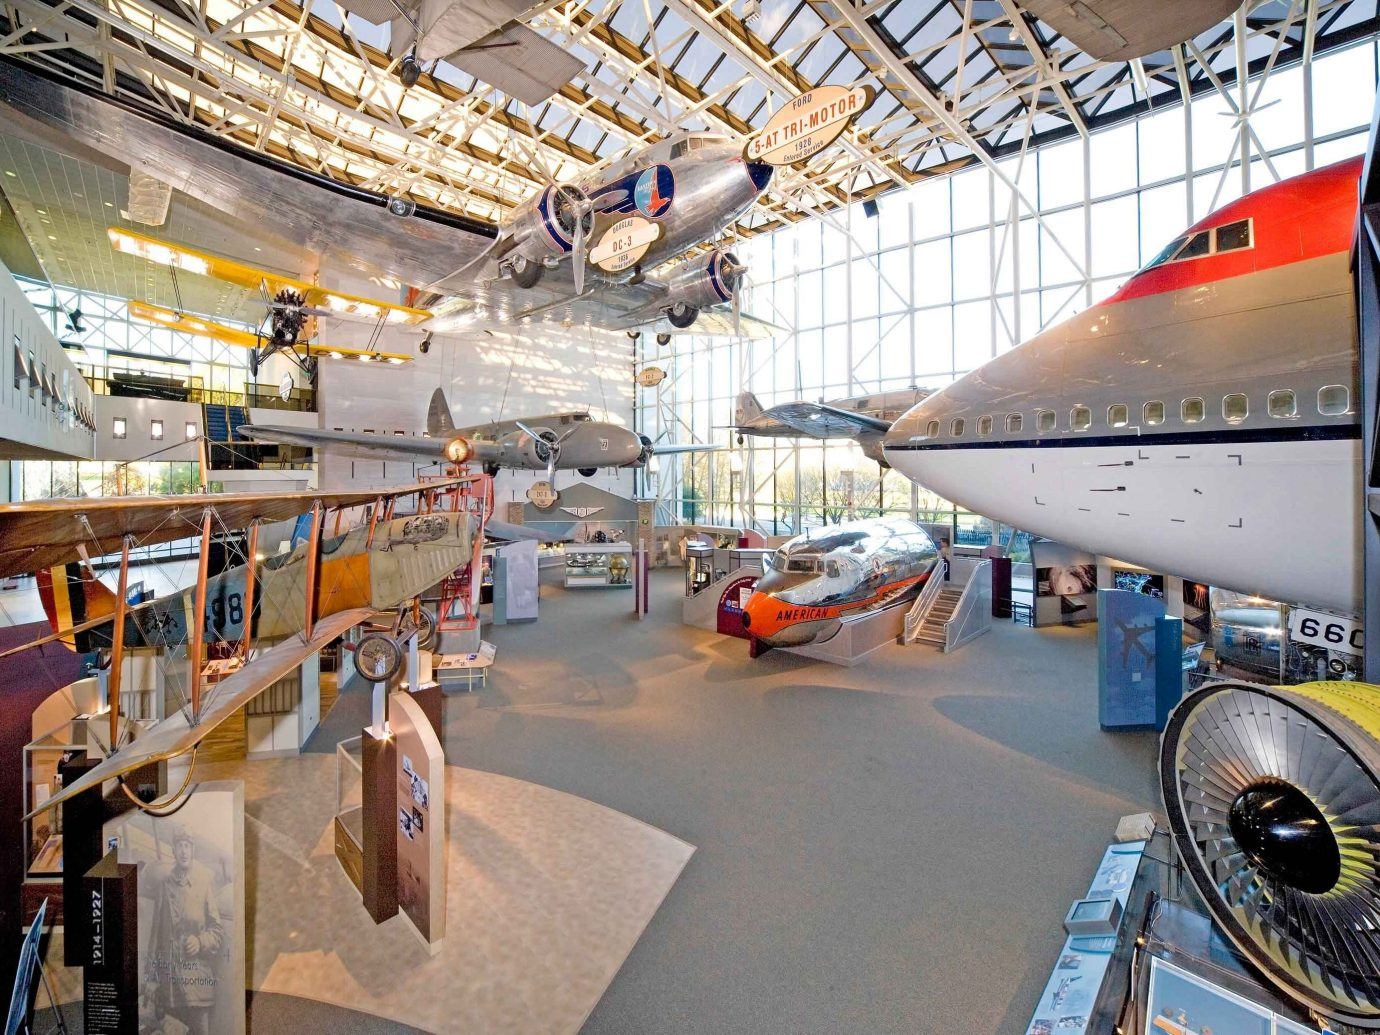 Budget indoor transport vehicle aviation aircraft engine tourist attraction airplane